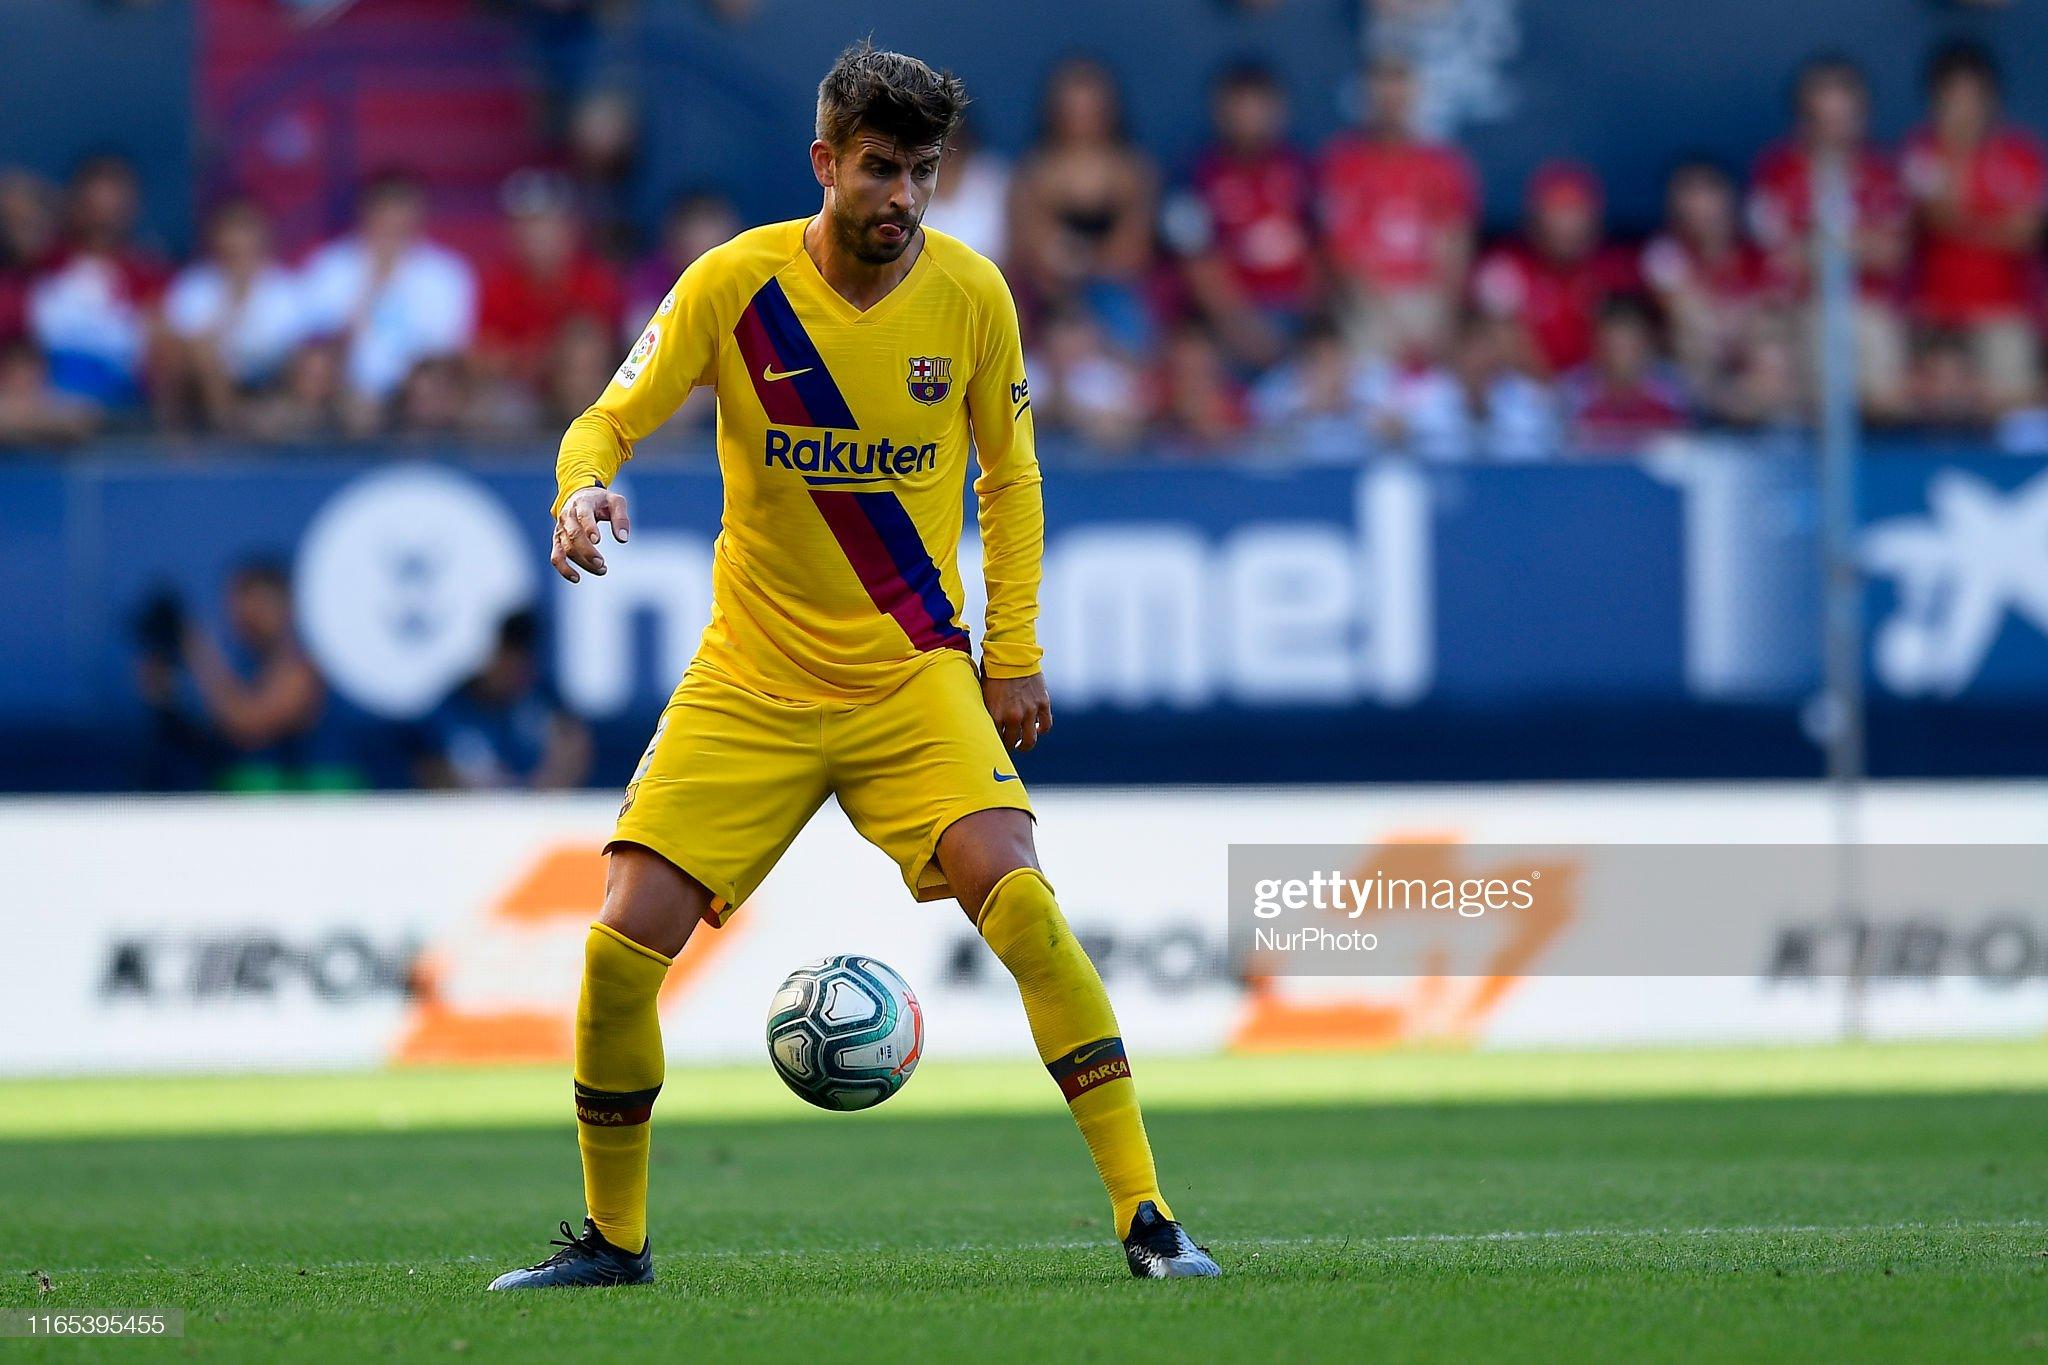 صور مباراة : أوساسونا - برشلونة 2-2 ( 31-08-2019 )  Gerard-pique-of-barcelona-controls-the-ball-during-the-liga-match-ca-picture-id1165395455?s=2048x2048